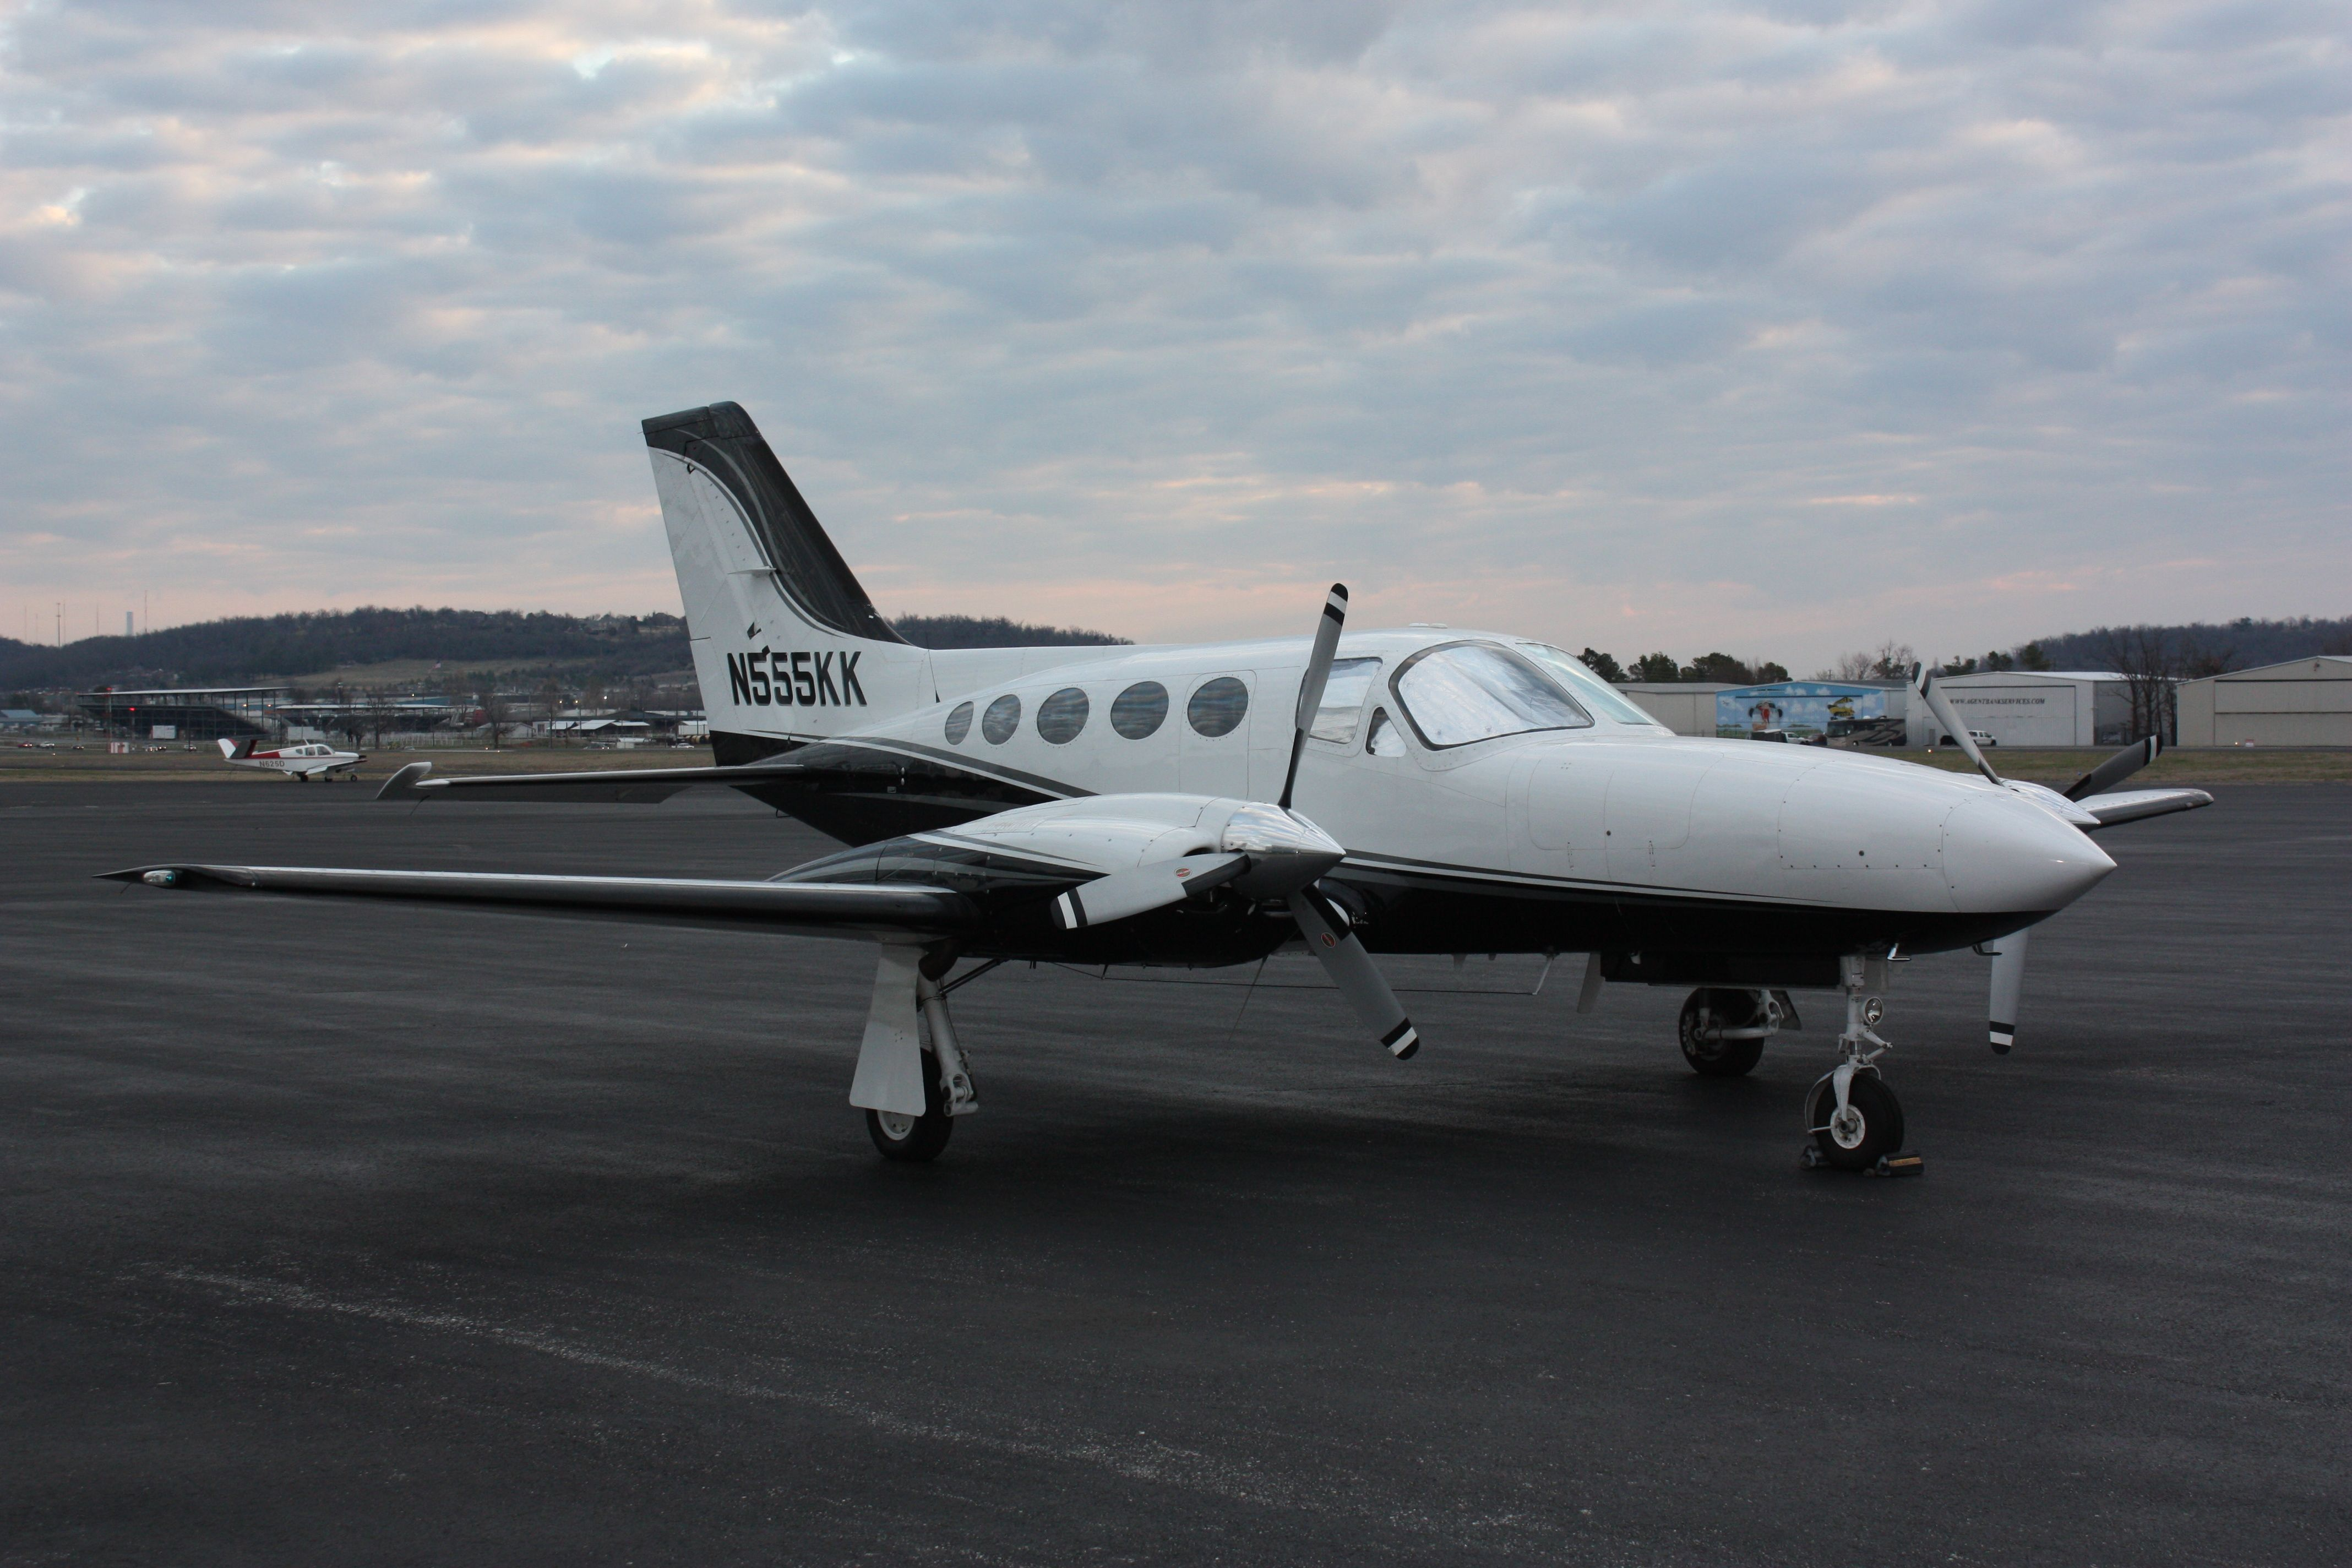 Cessna 421c aircraft vehicles engineering